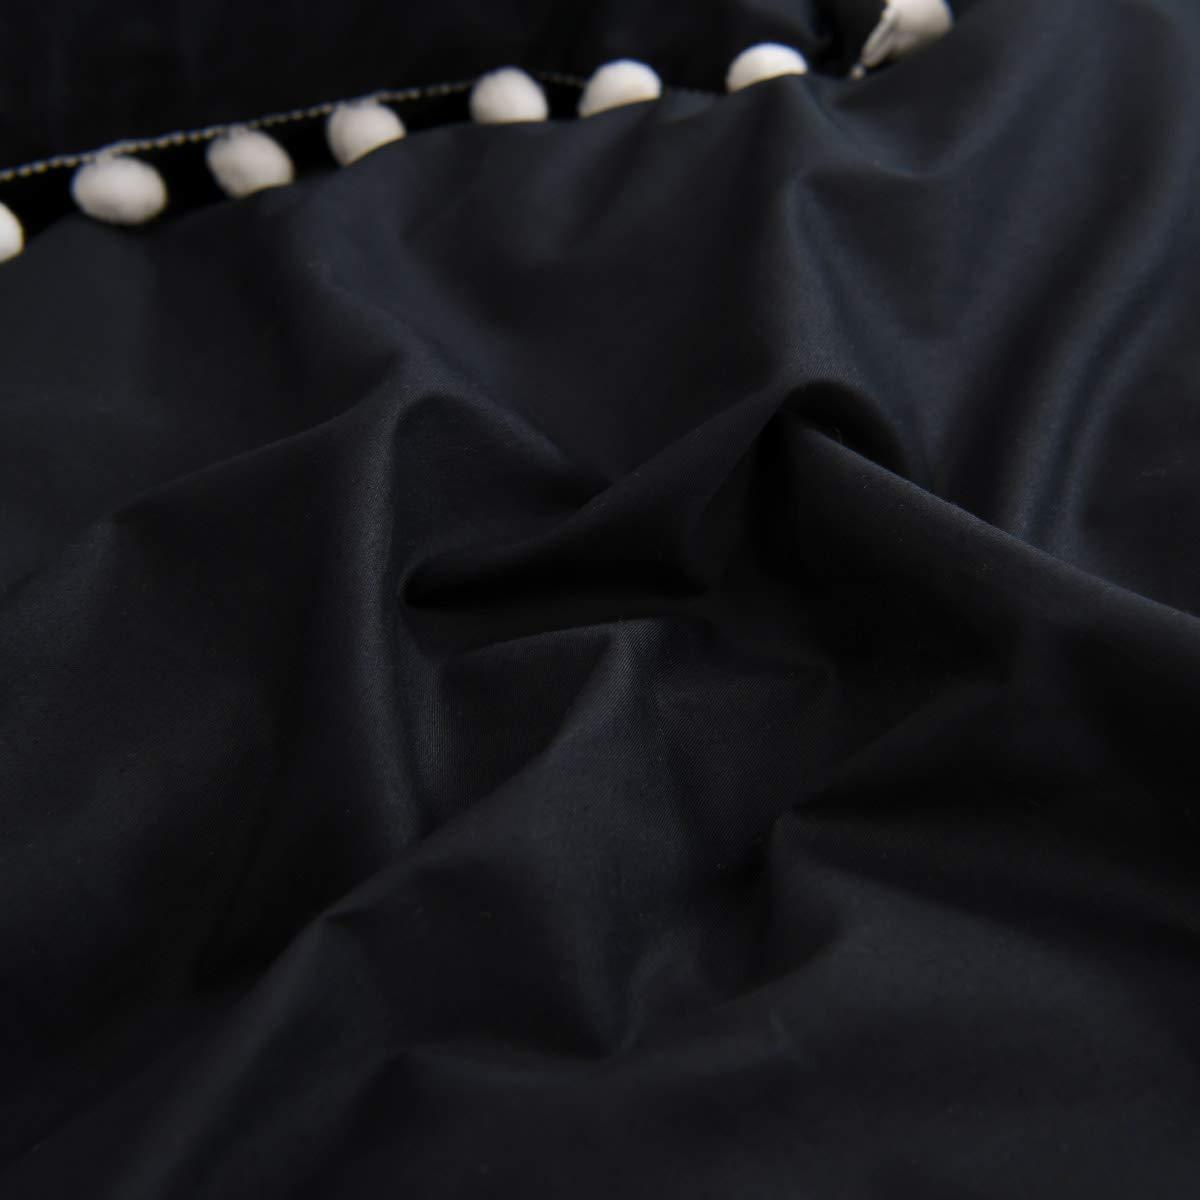 Softta Girls Bedding Pink Duvet Cover Full 3 Pcs Ruffle Pom-Fringe Pompoms Bohemian Bedding 100/% Washed Cotton Boho Baby Teen Girls Bed Cover